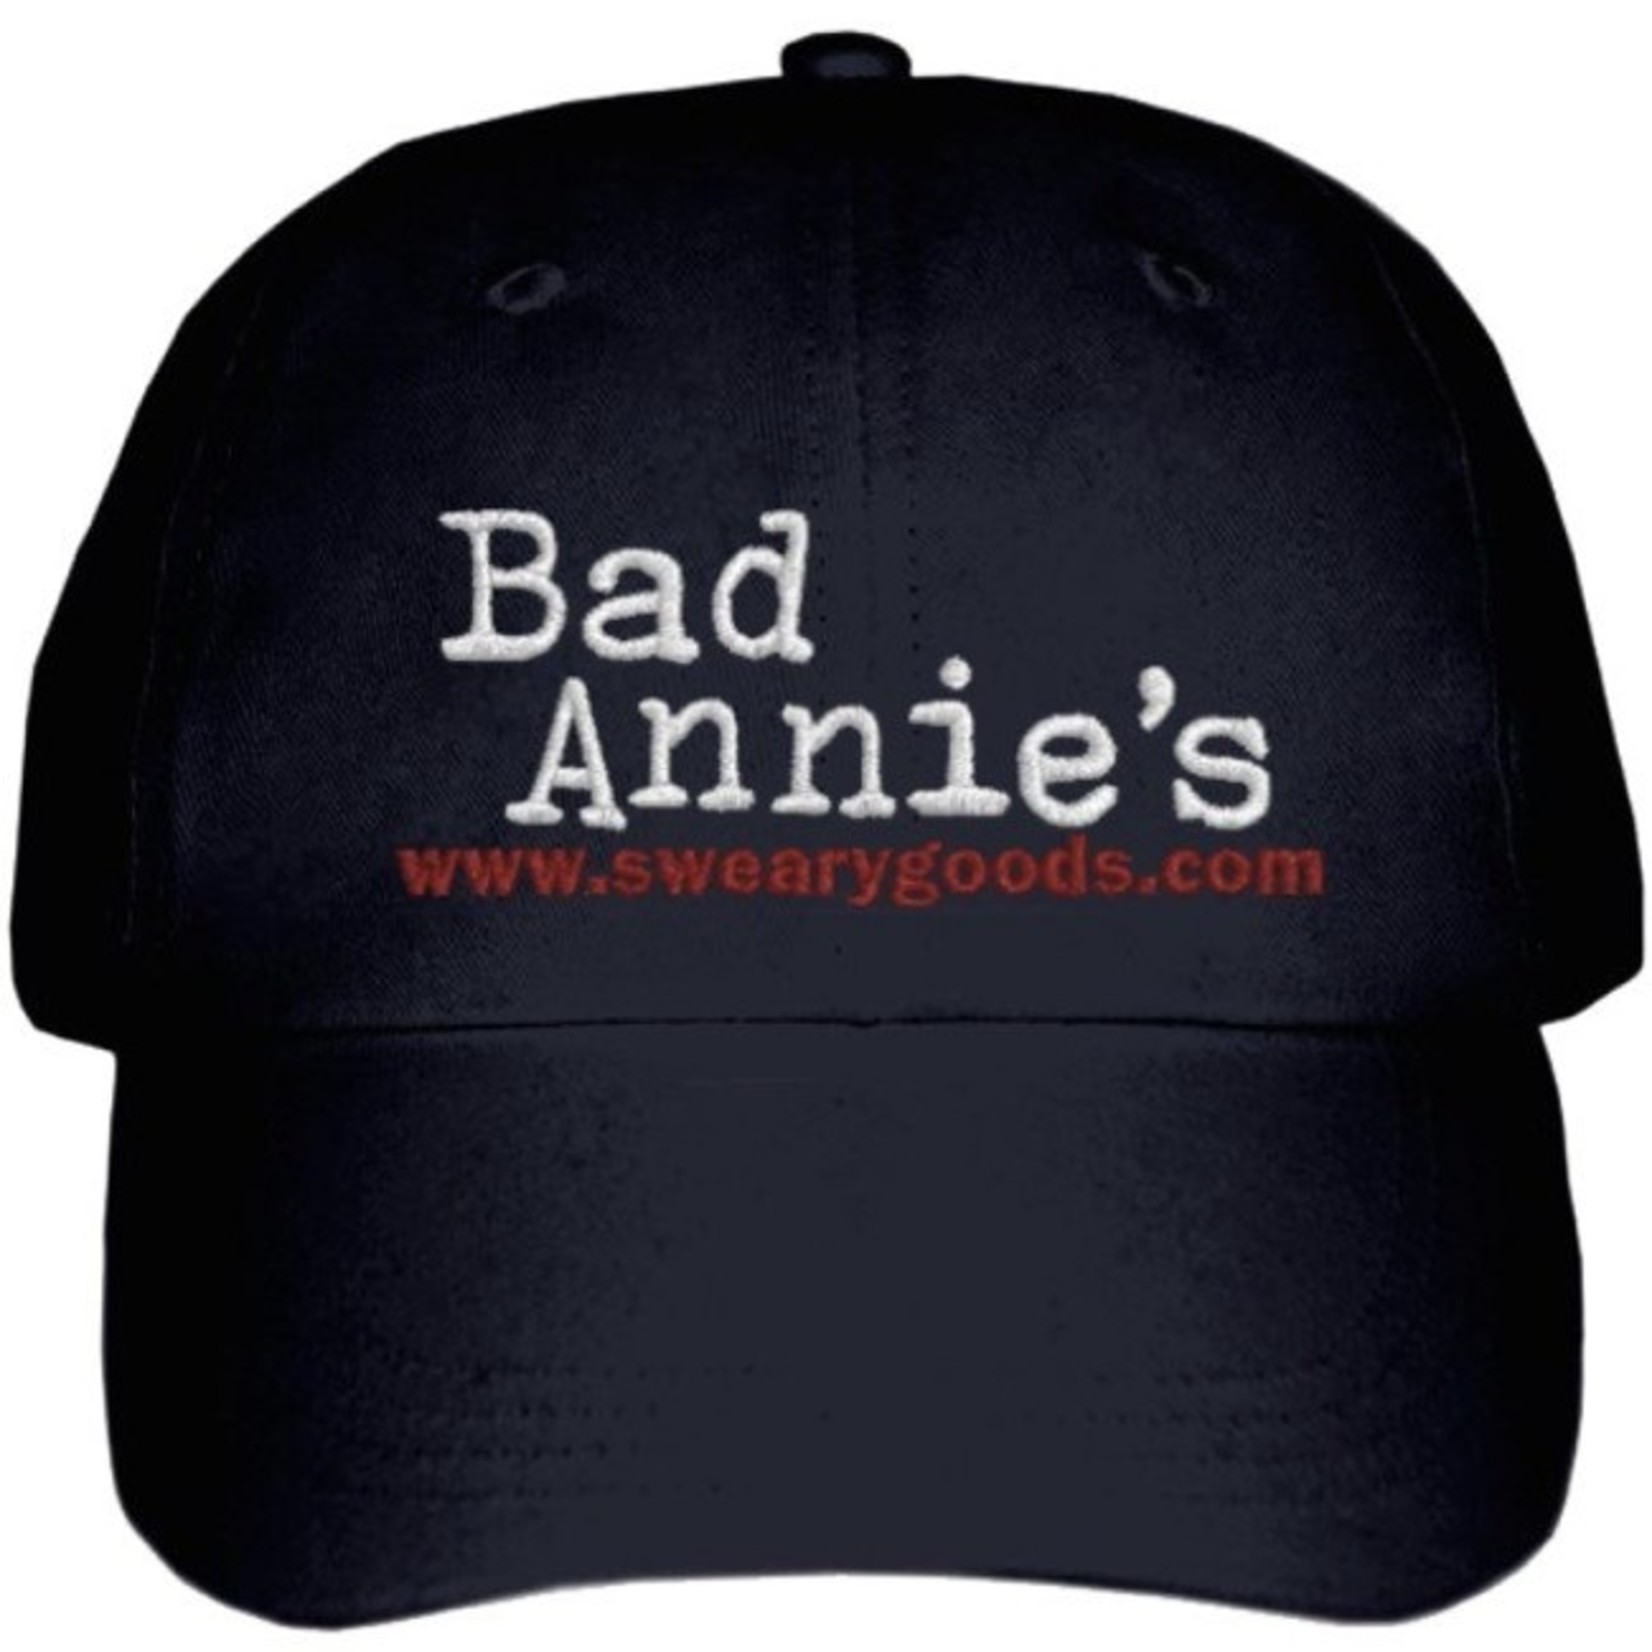 Bad Annie's Hat - Bad Annies